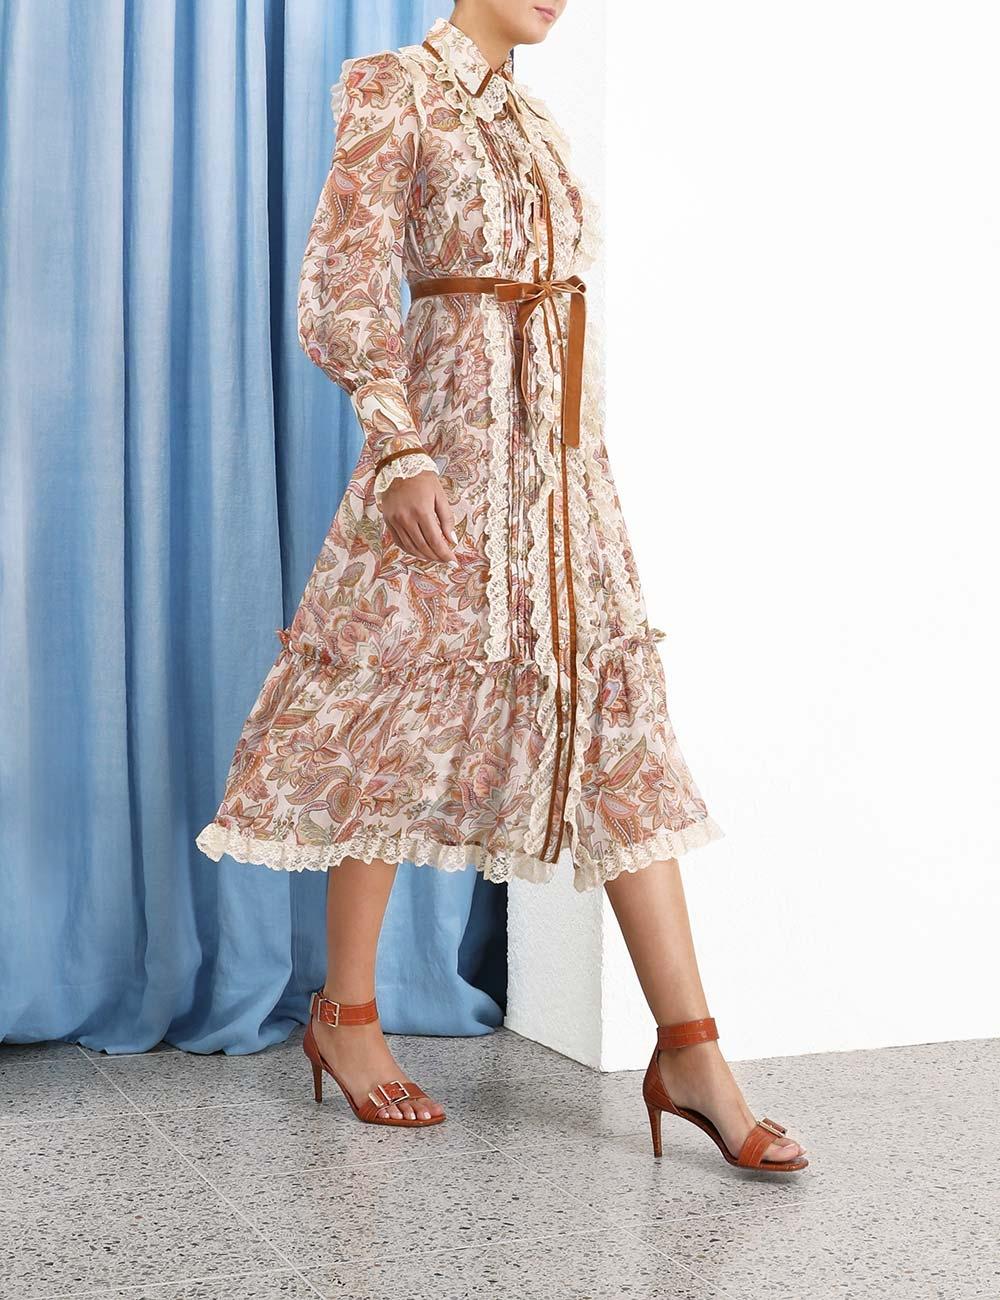 Lucky Lace Collar Dress